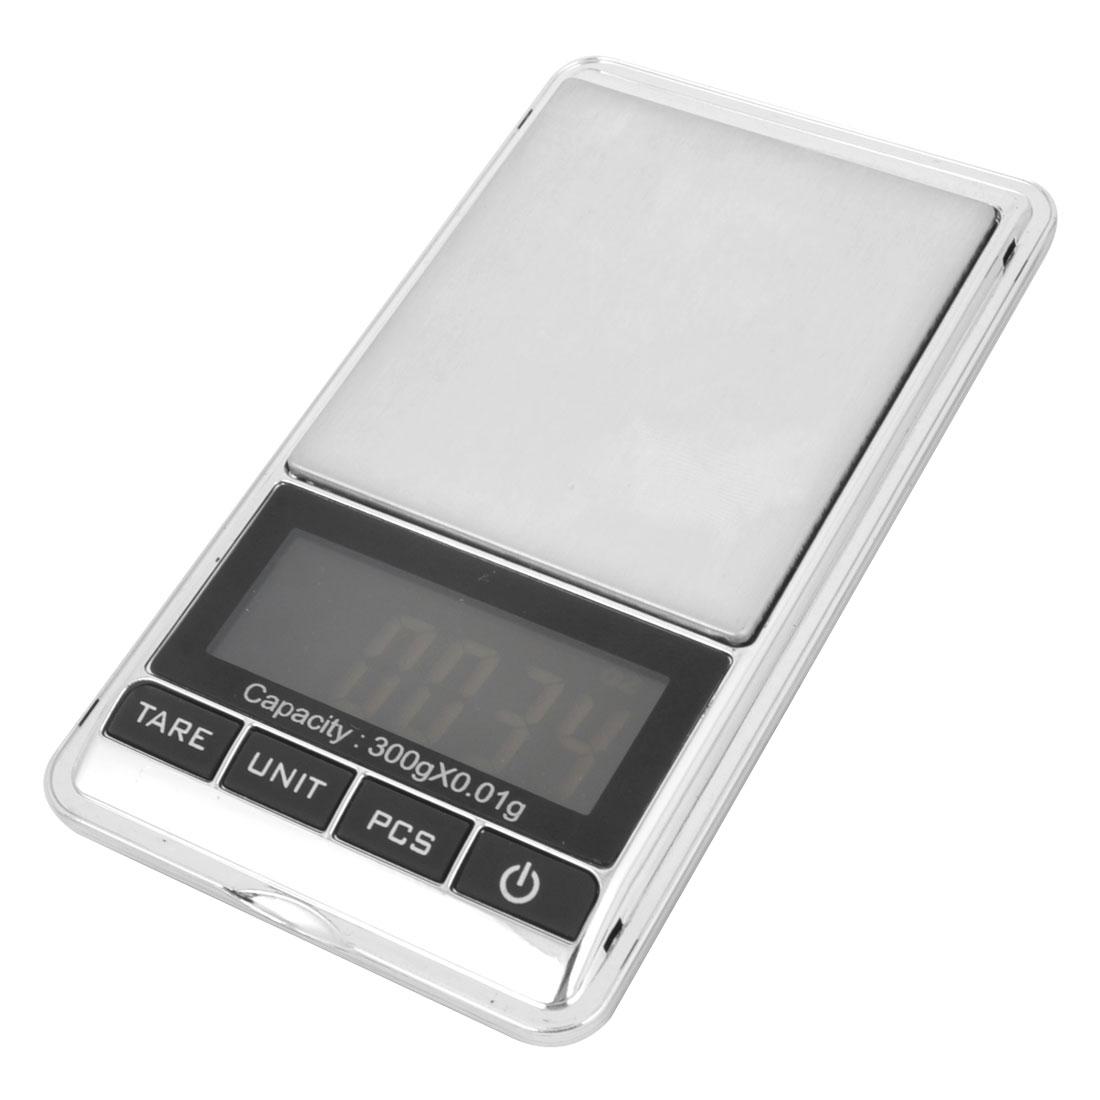 Handheld Portable Pocket Digital Scale 300gx0.01g Black Silver Tone w Cover